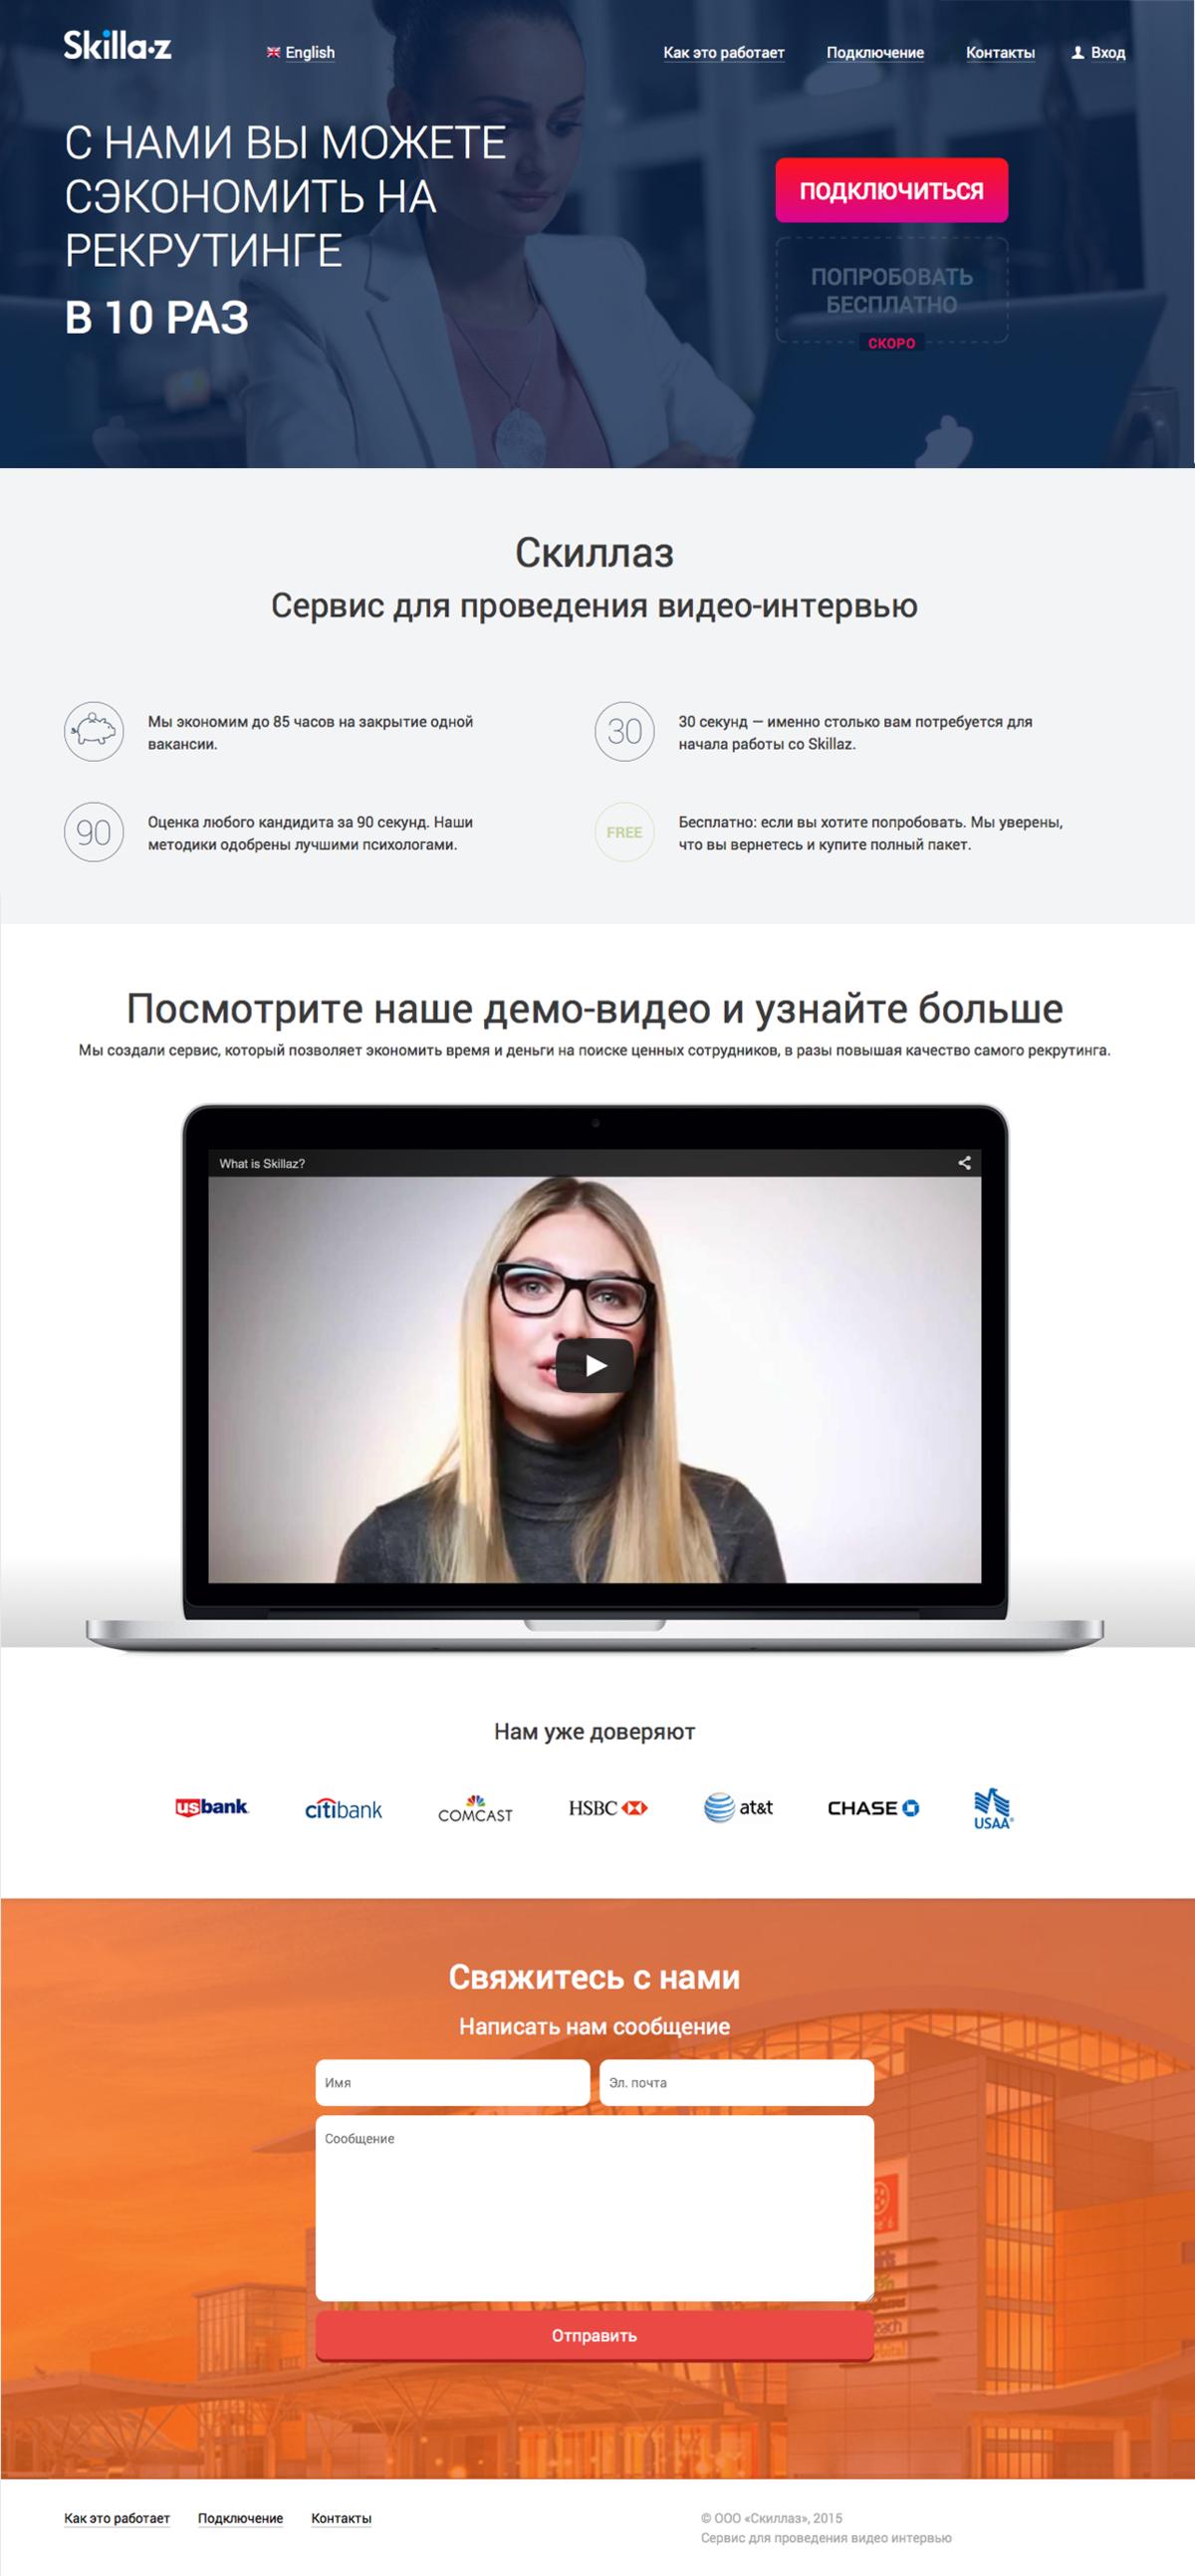 Skillaz.co / Проект компании Duotek